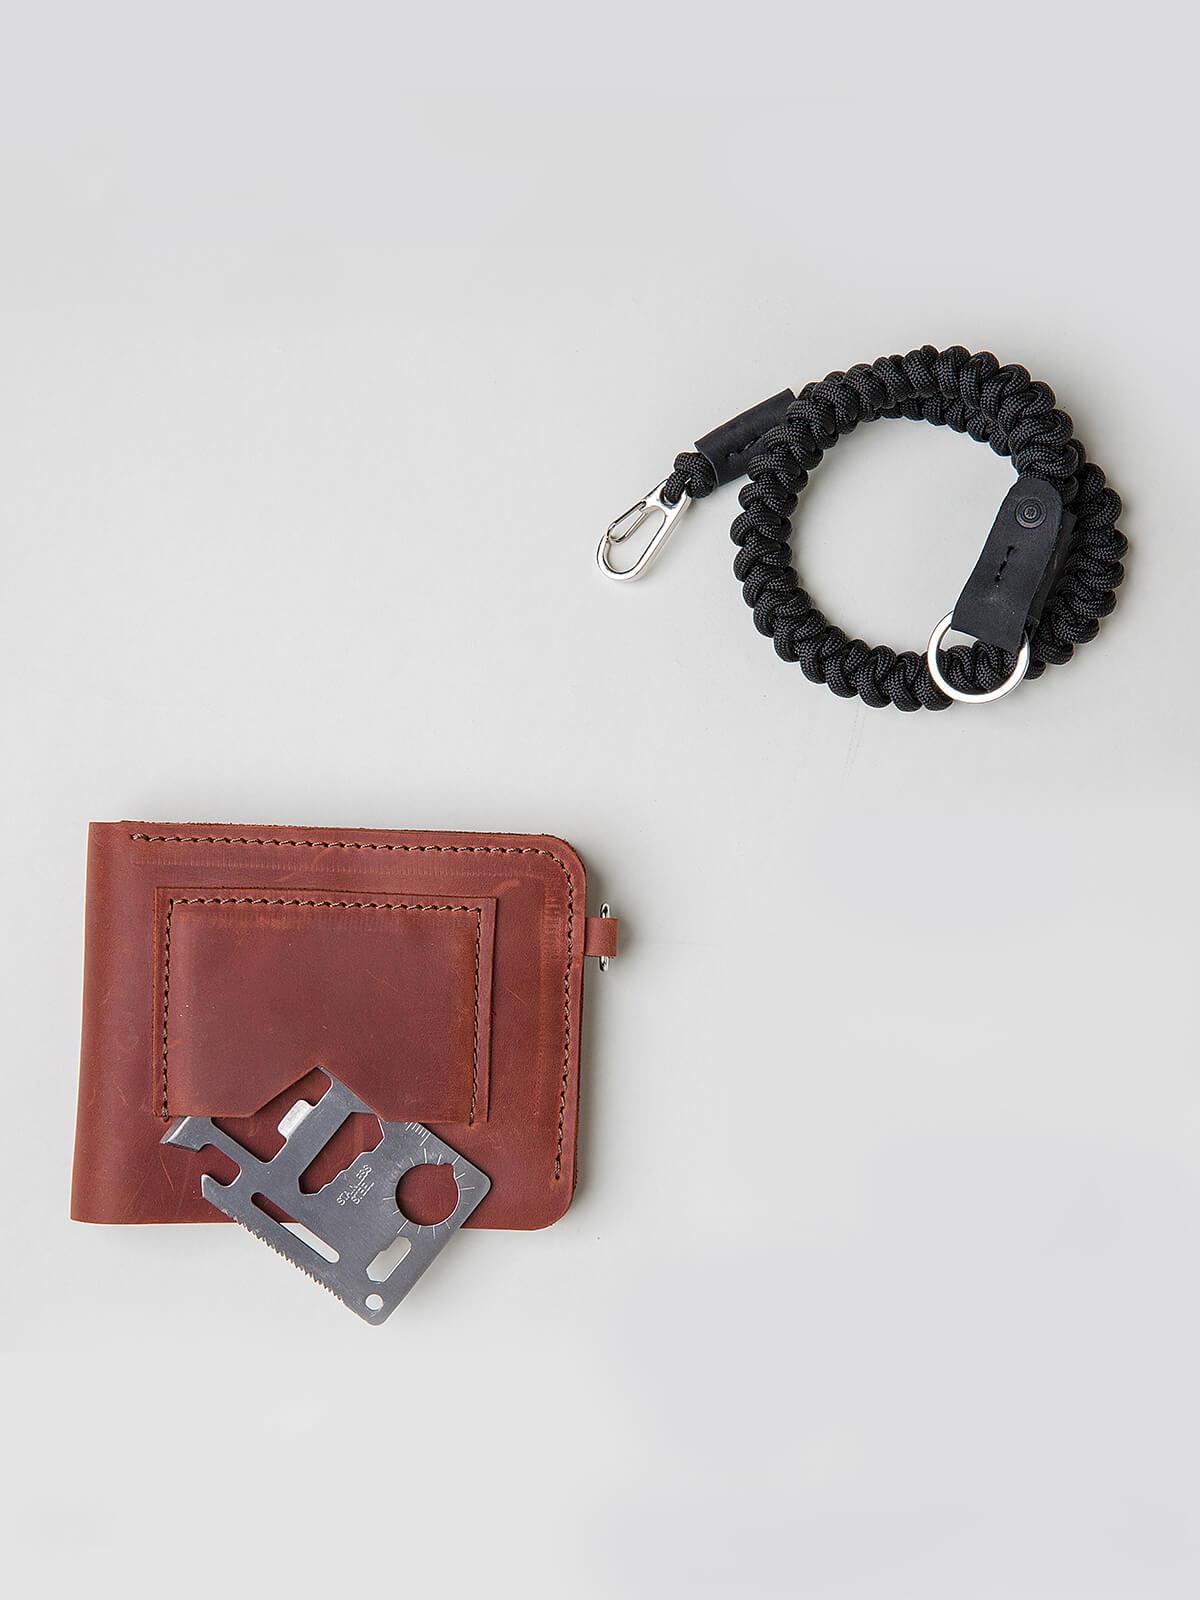 Wallet Roundel. Color light brown. 3.